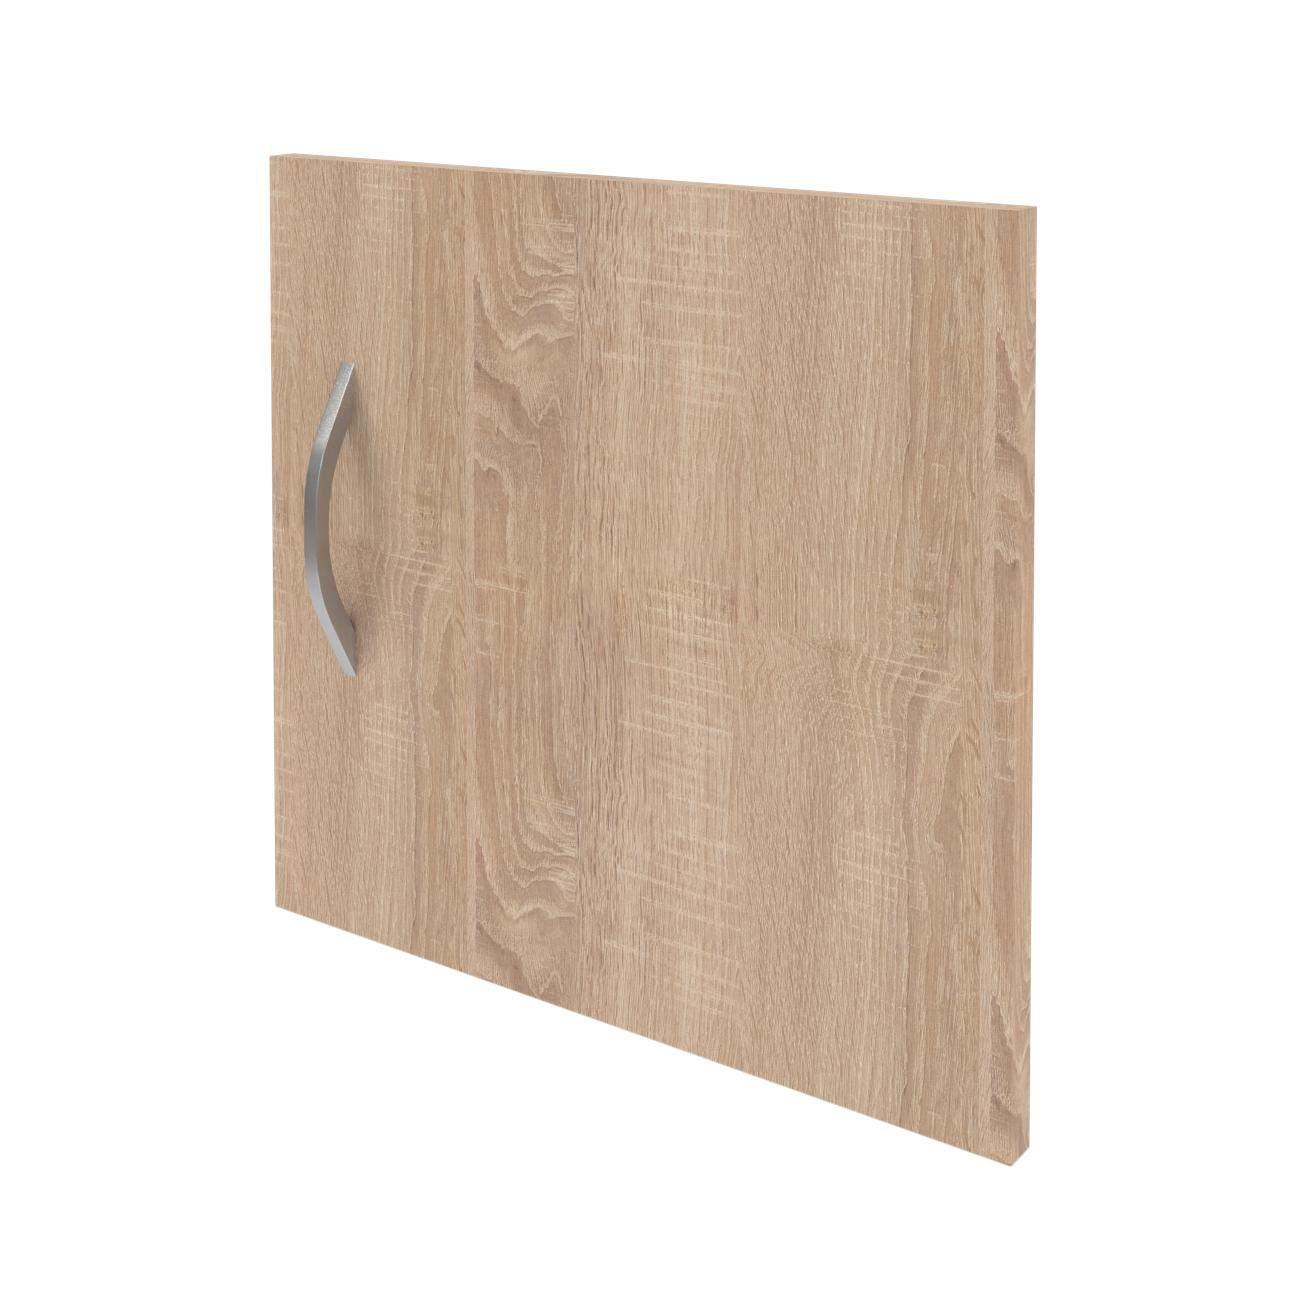 Дверь ЛДСП для антресоли правая 382х16х364